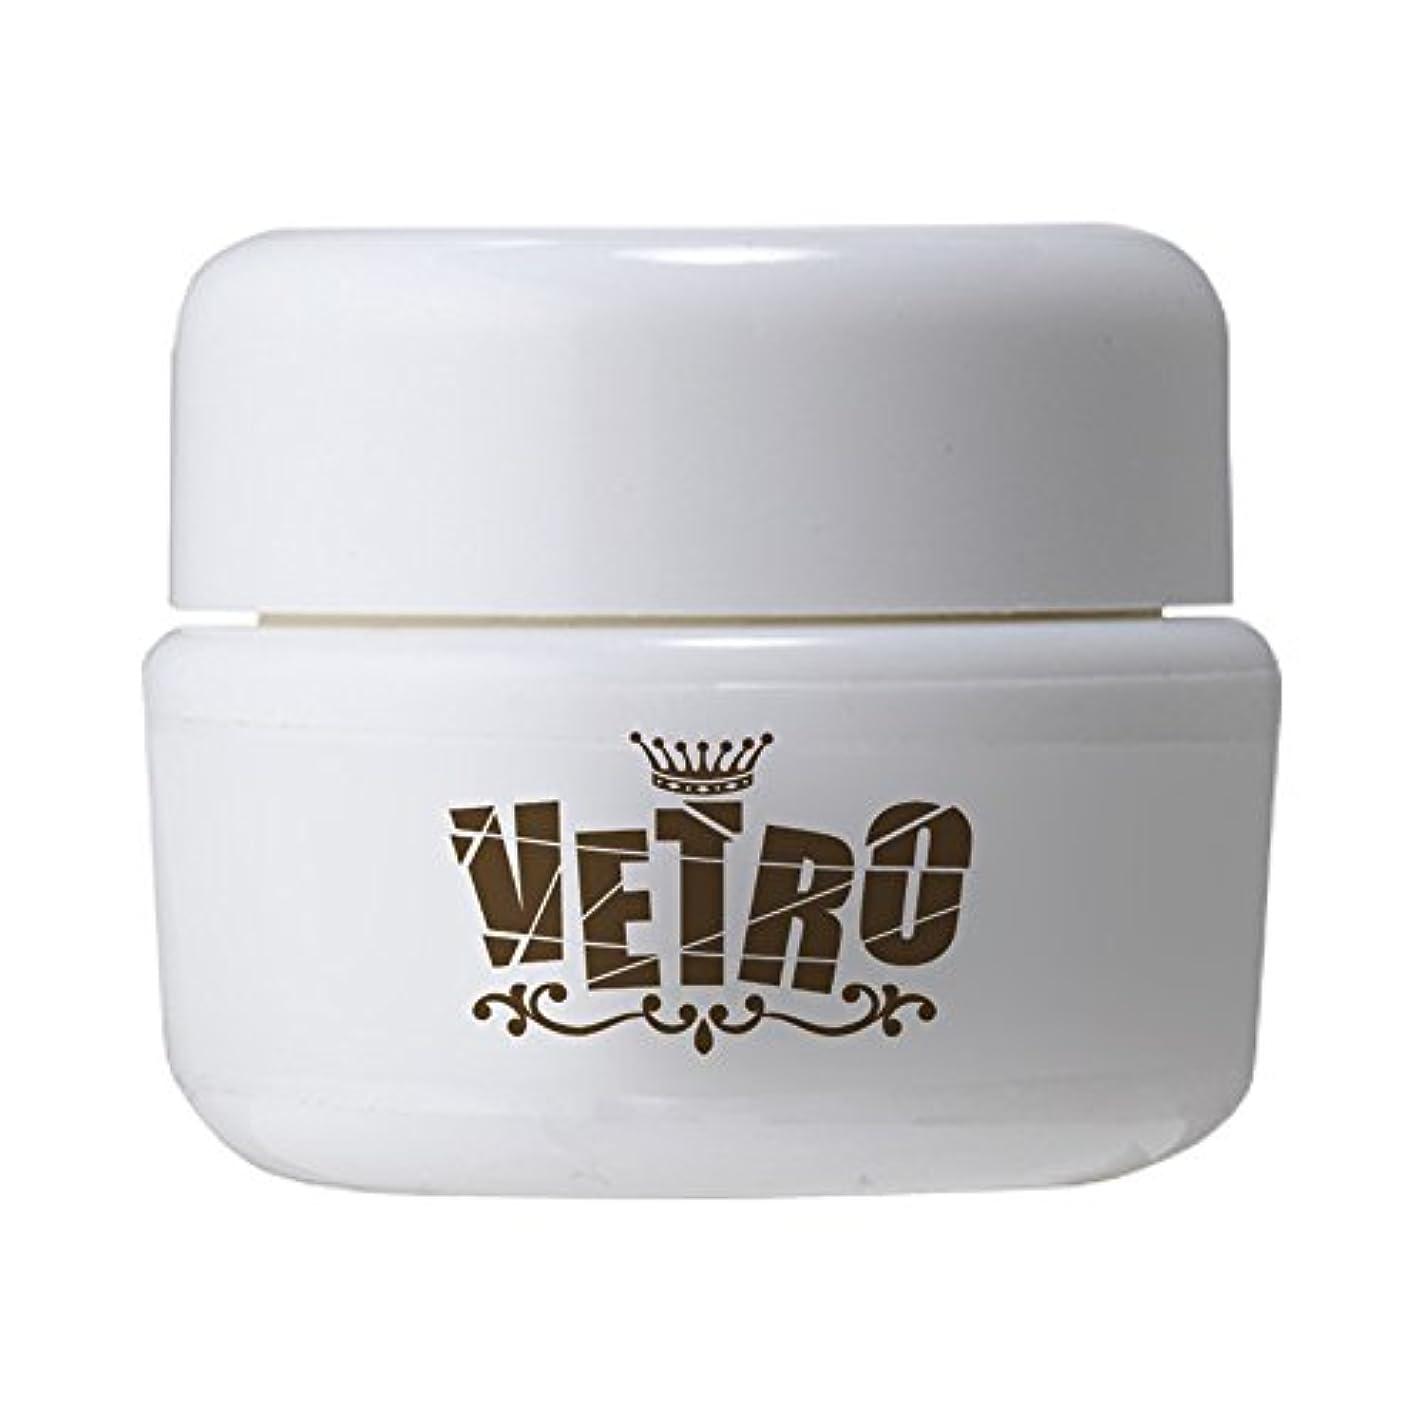 VETRO No.19 カラージェル マット VL067 リップス 4ml